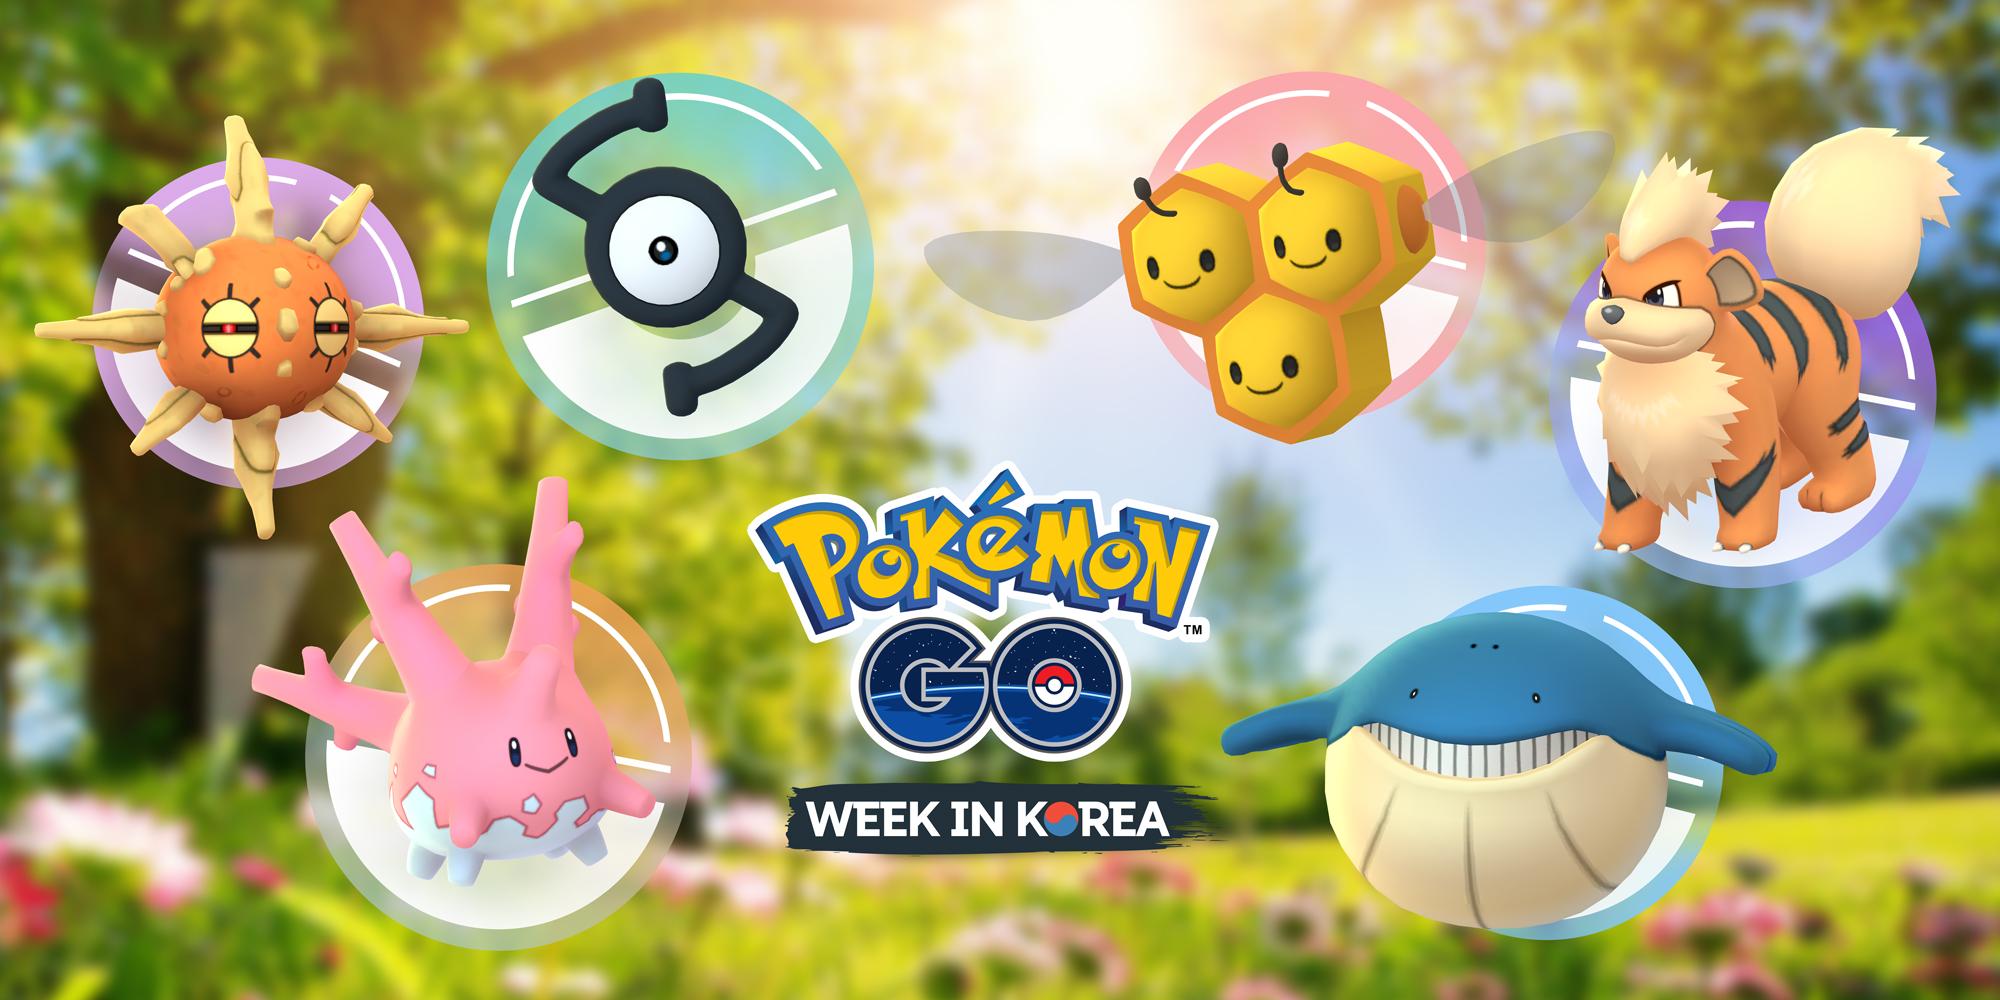 Pokémon GO Week in Korea 2019